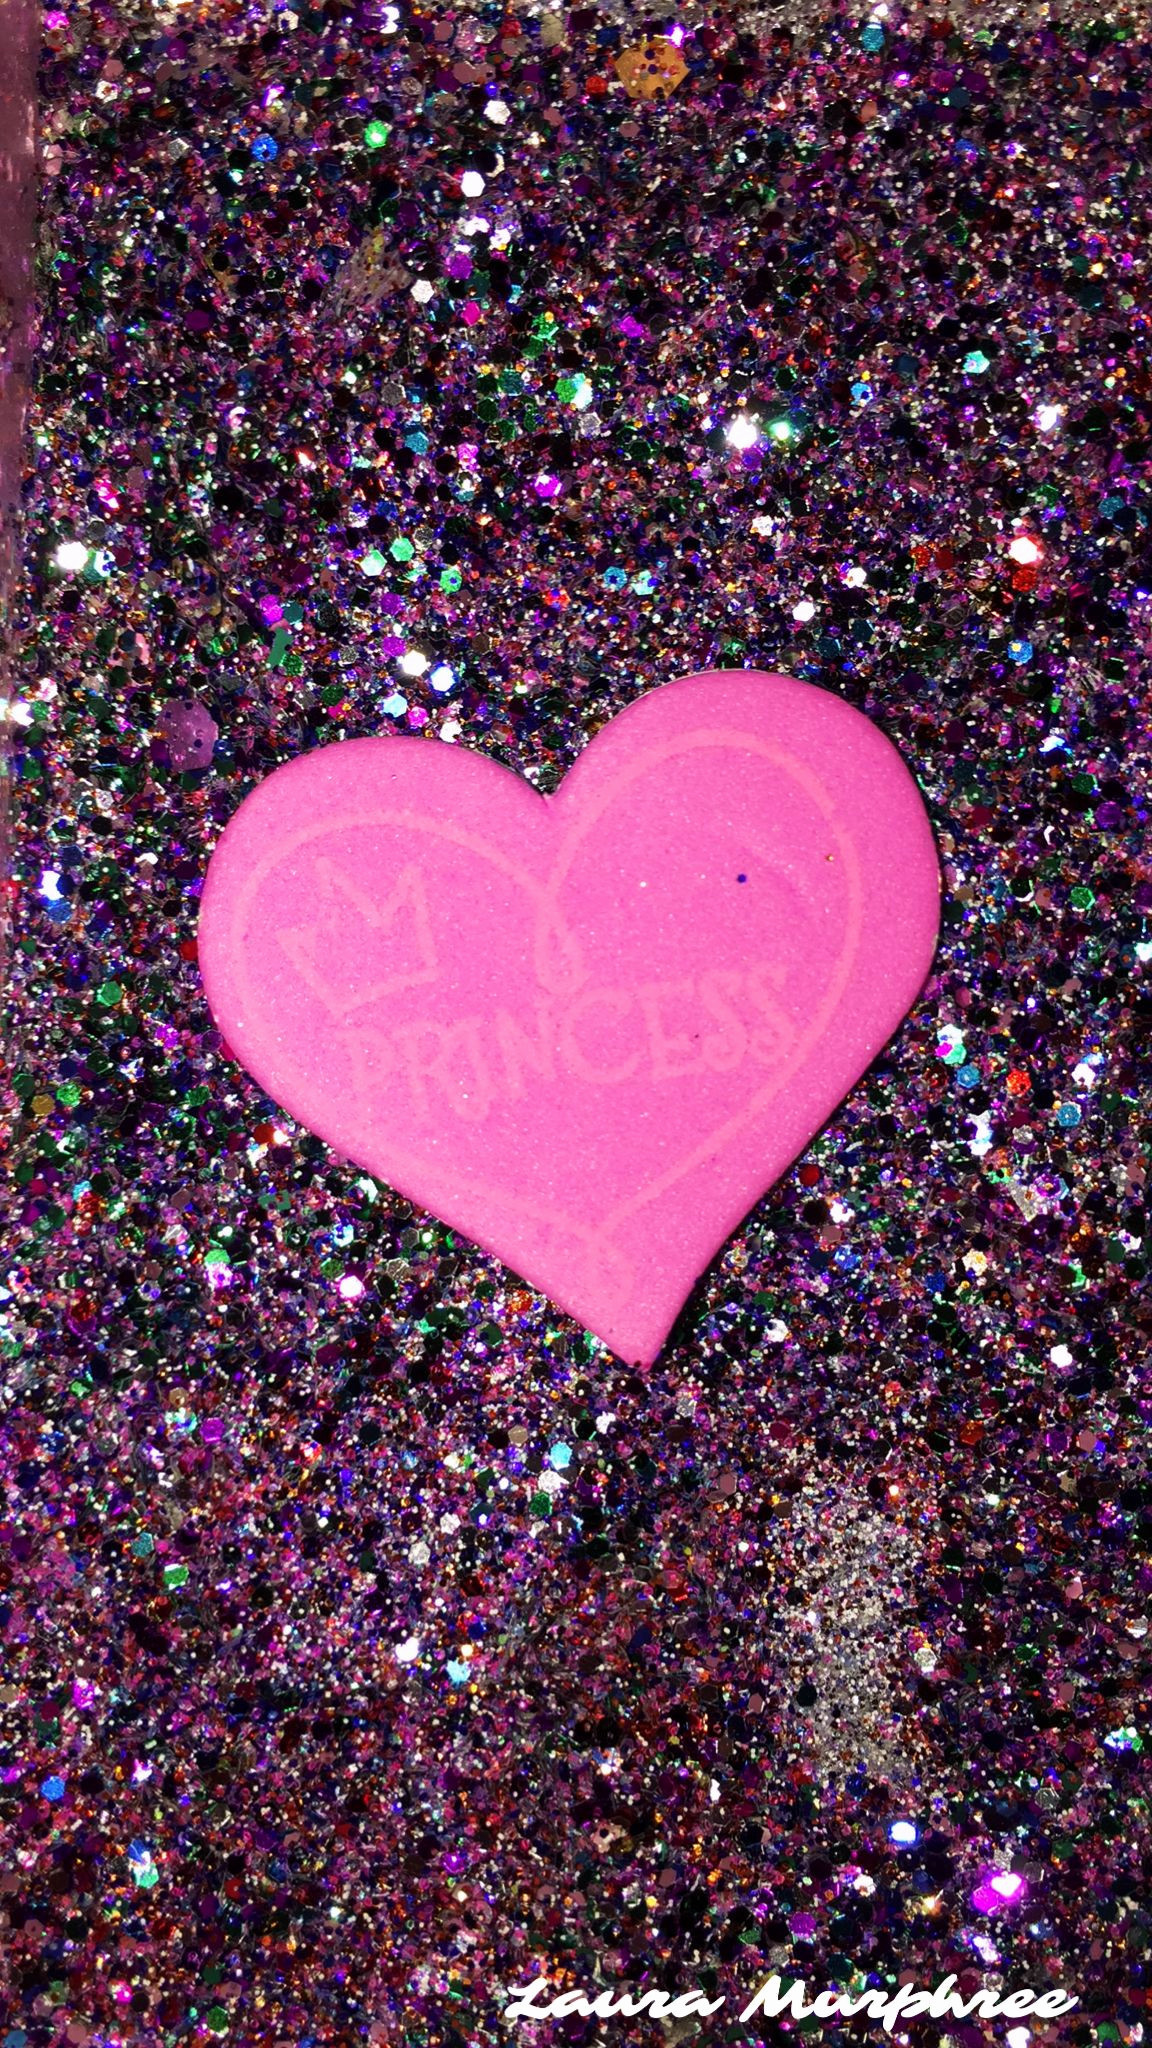 1152x2048, Love Girly Wallpaper For Iphone Luxury Glitter - HD Wallpaper